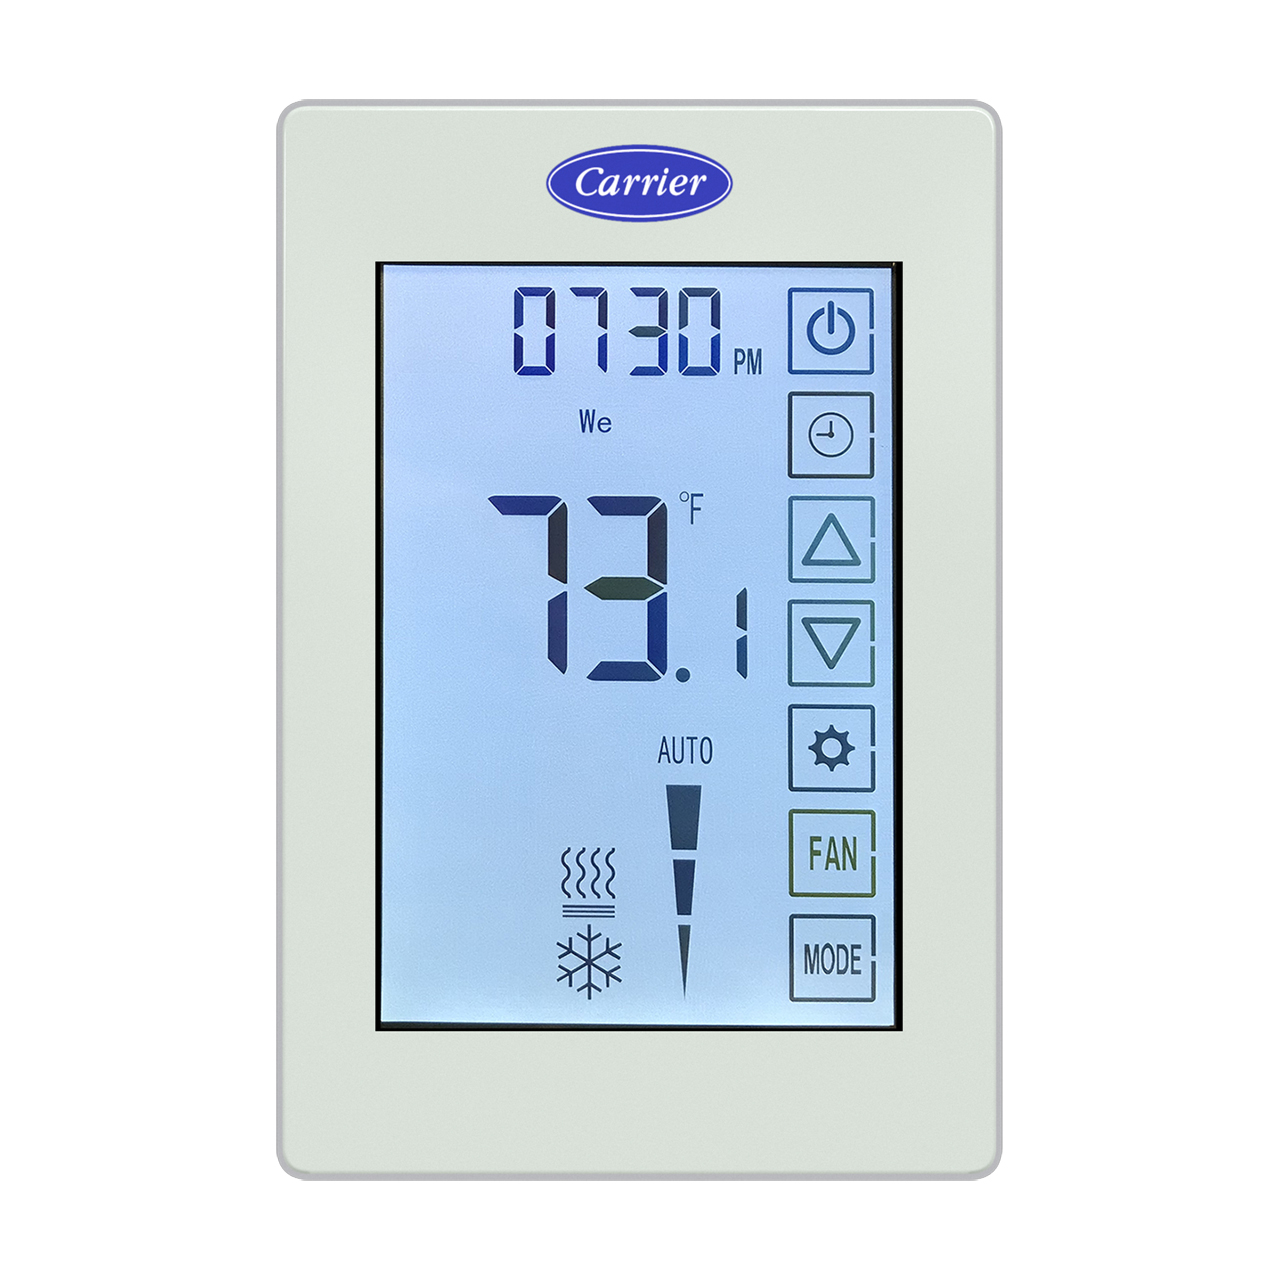 carrier-TBPL-H-C-comfortvu-bacnet-thermostat